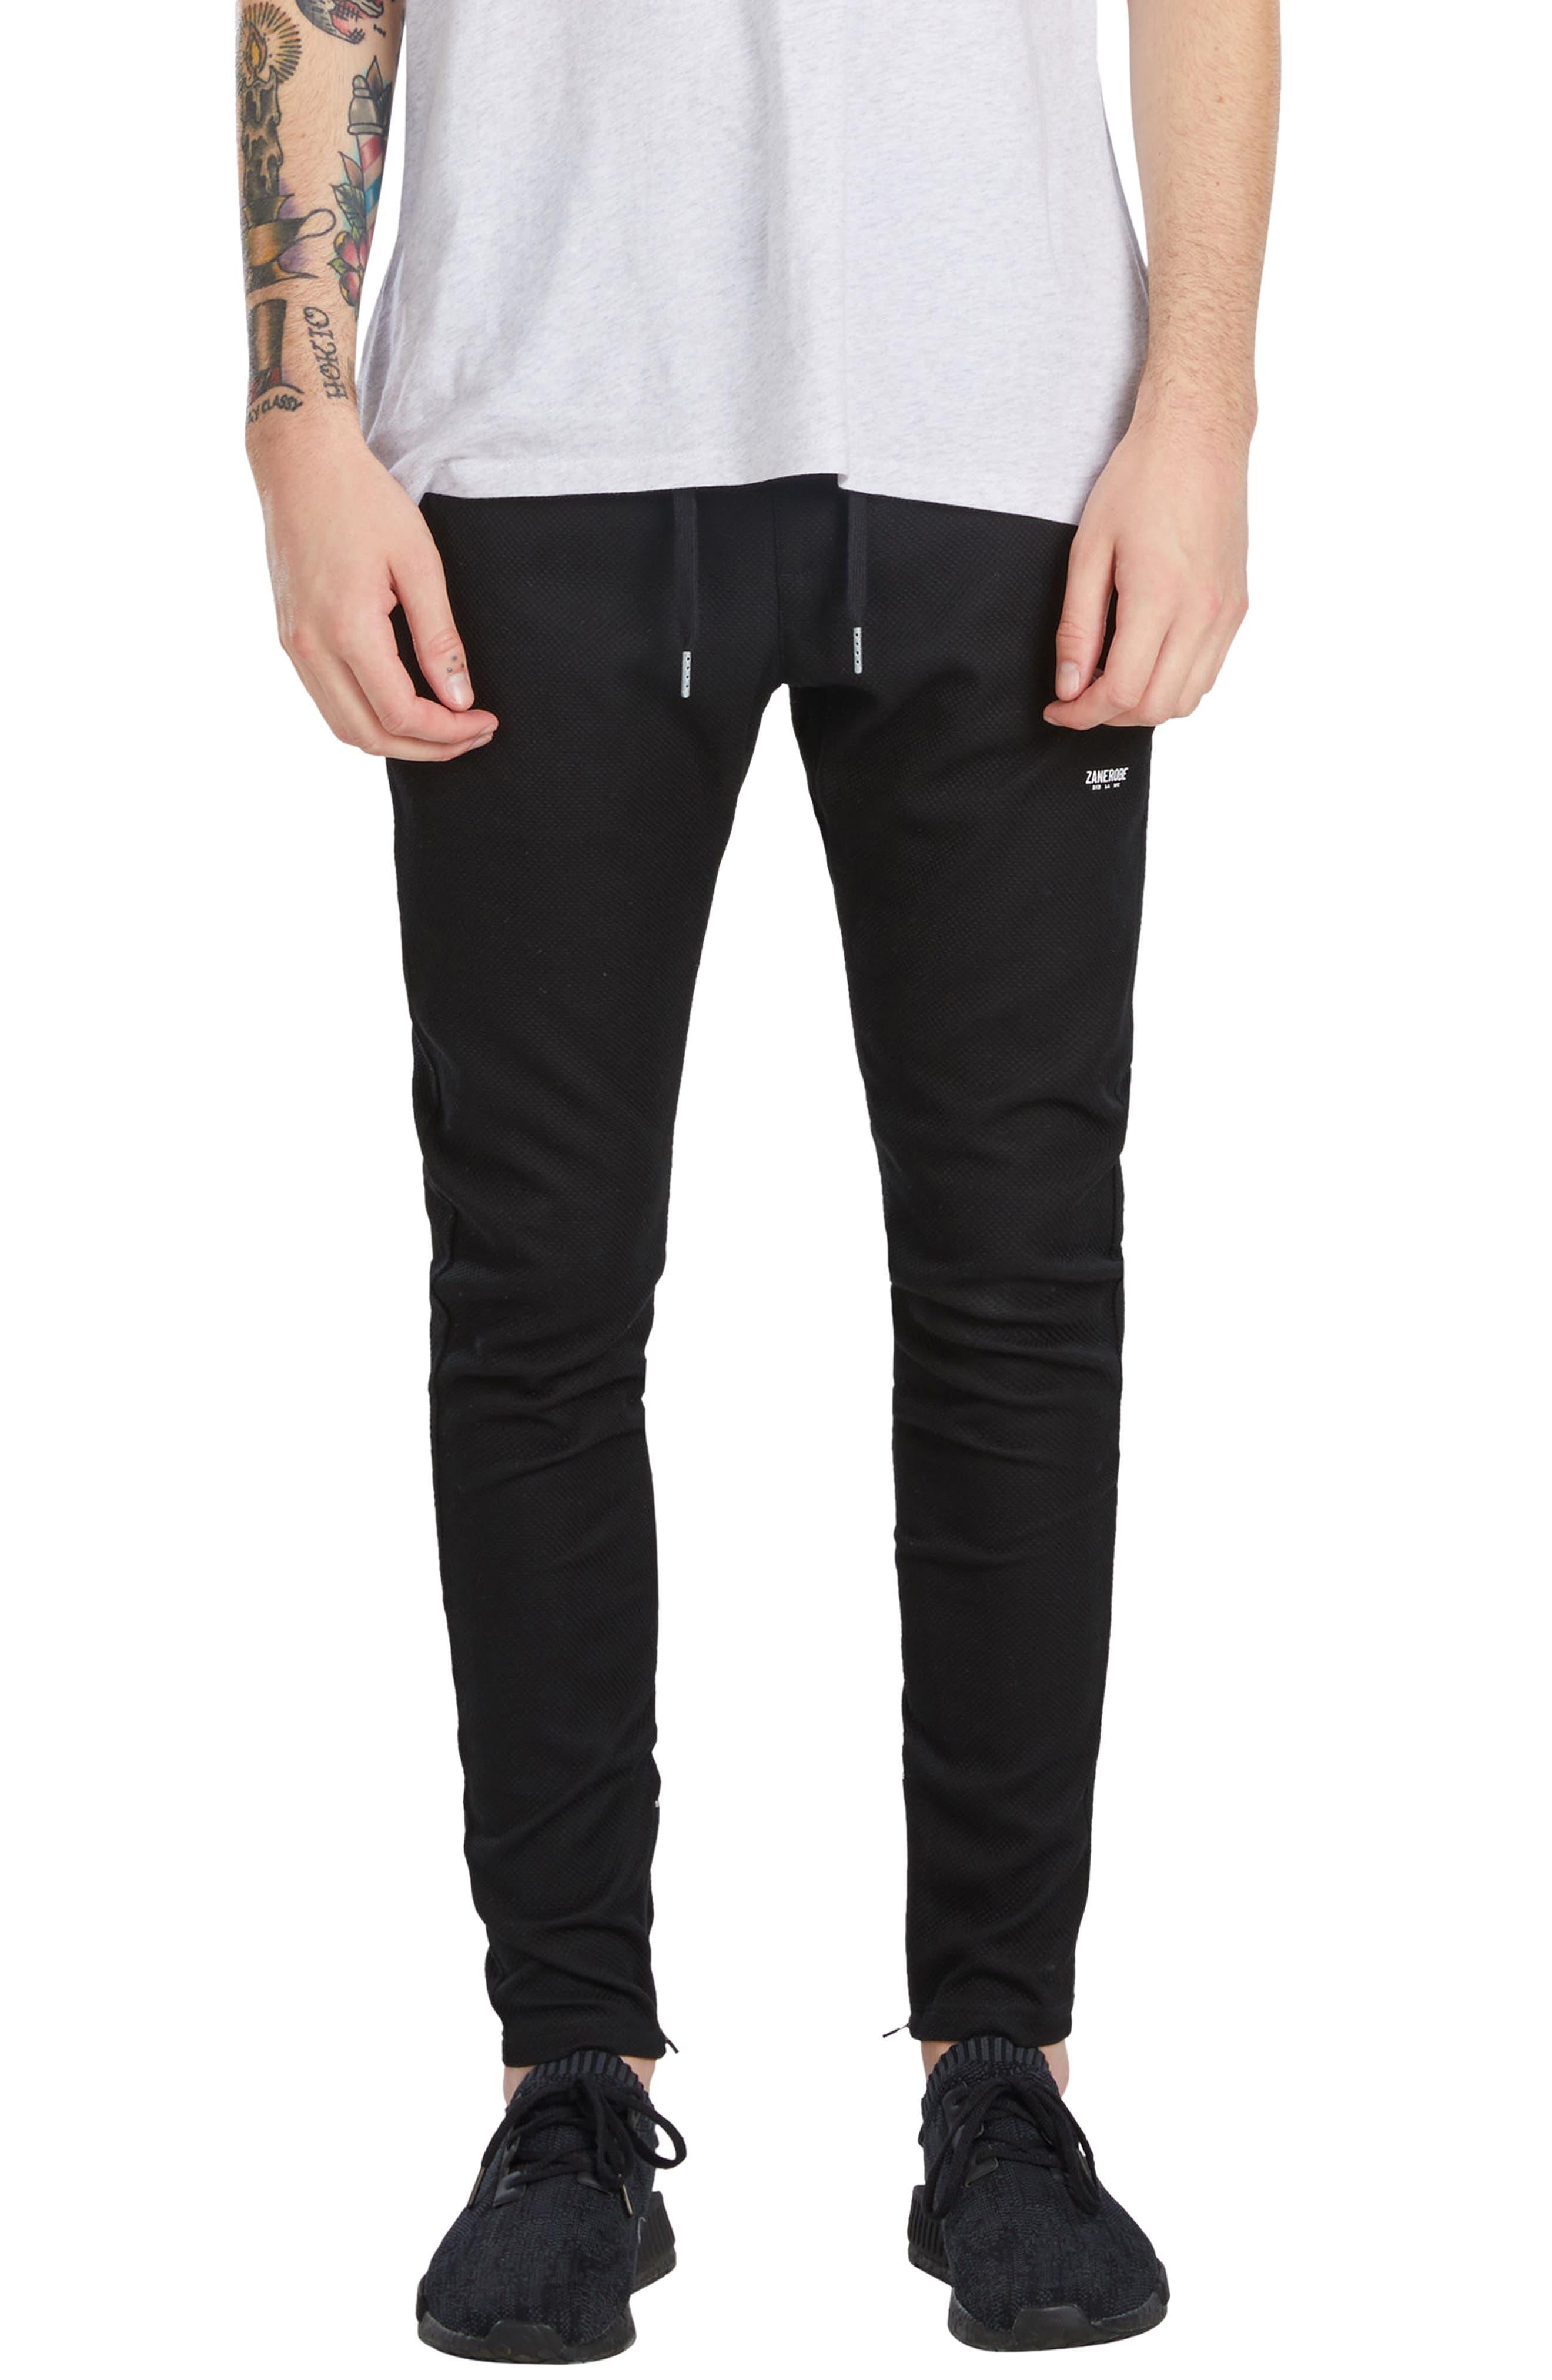 Waffle Cling Pants,                         Main,                         color, Black